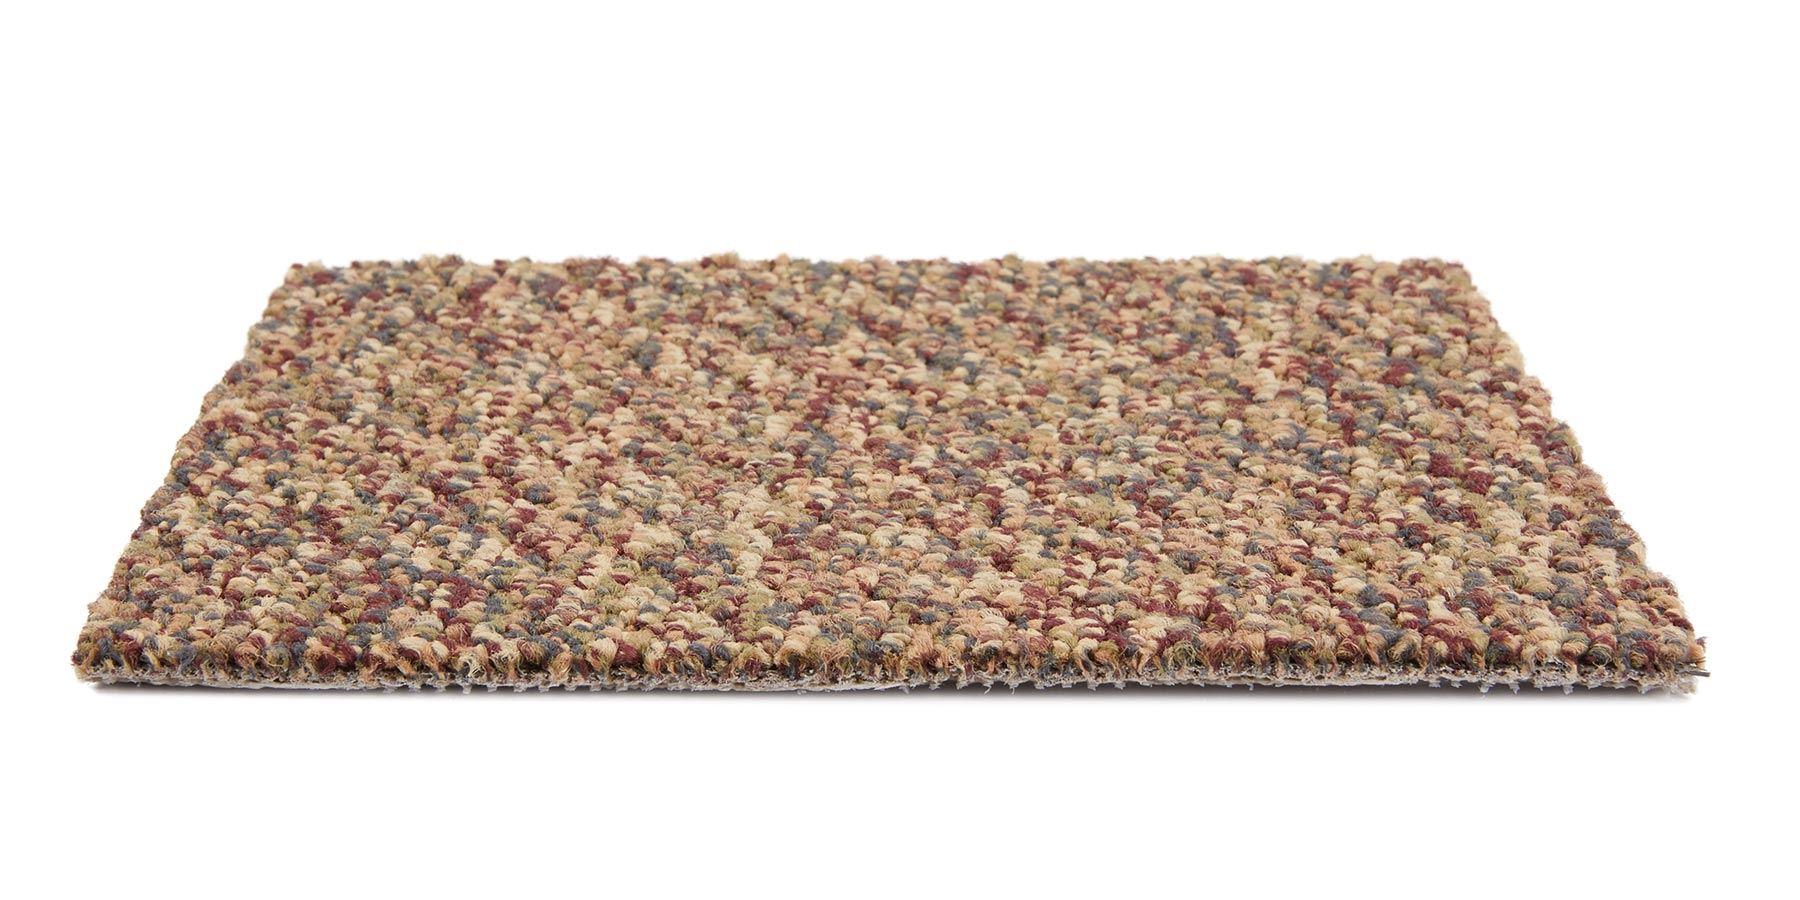 Franchise II Commercial Carpet And Carpet Tile